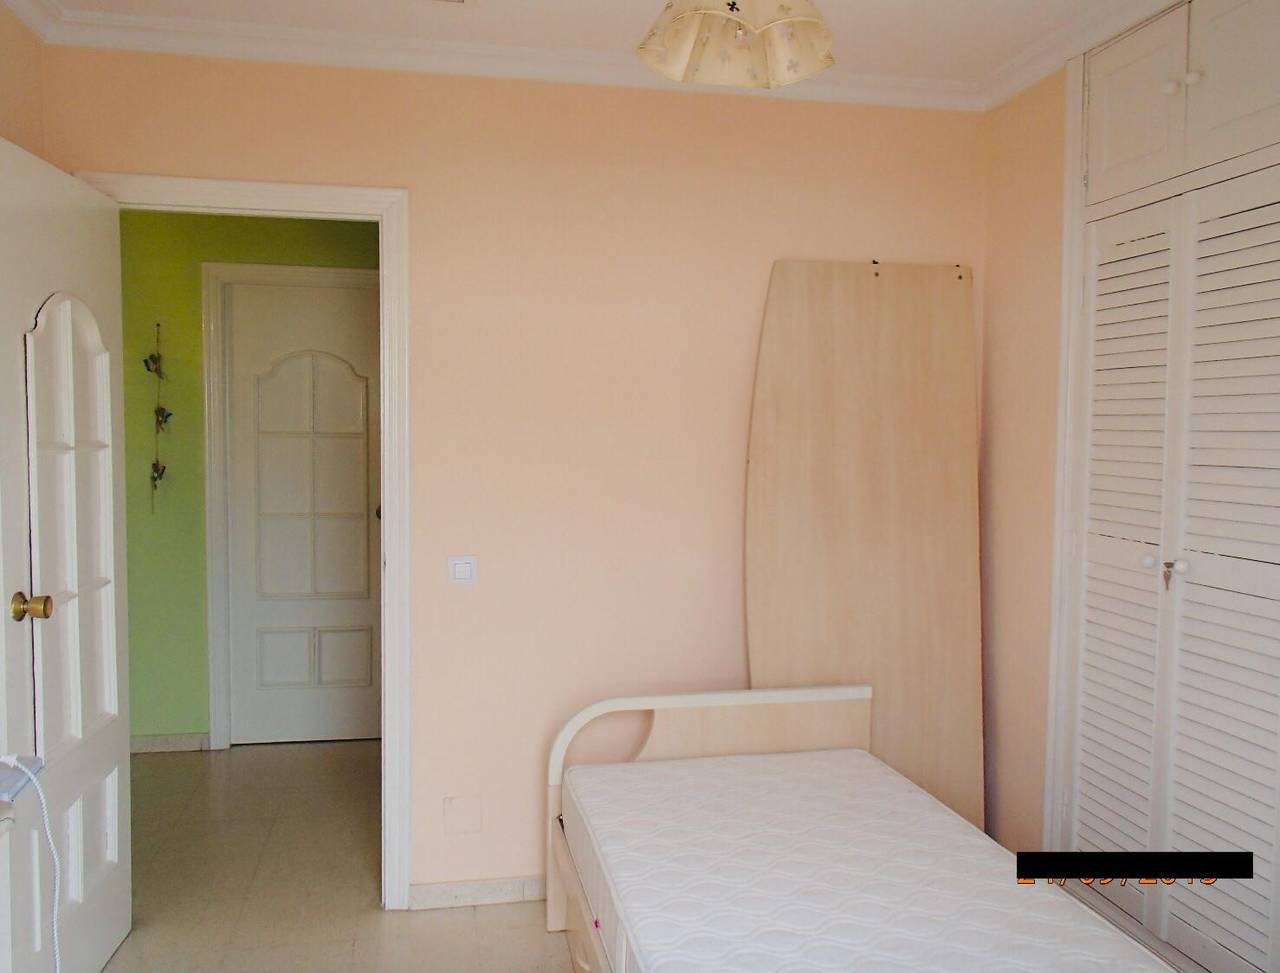 Particular alquila/vende preciosa casa adosada esquinera Coria del Rio  - Foto 3